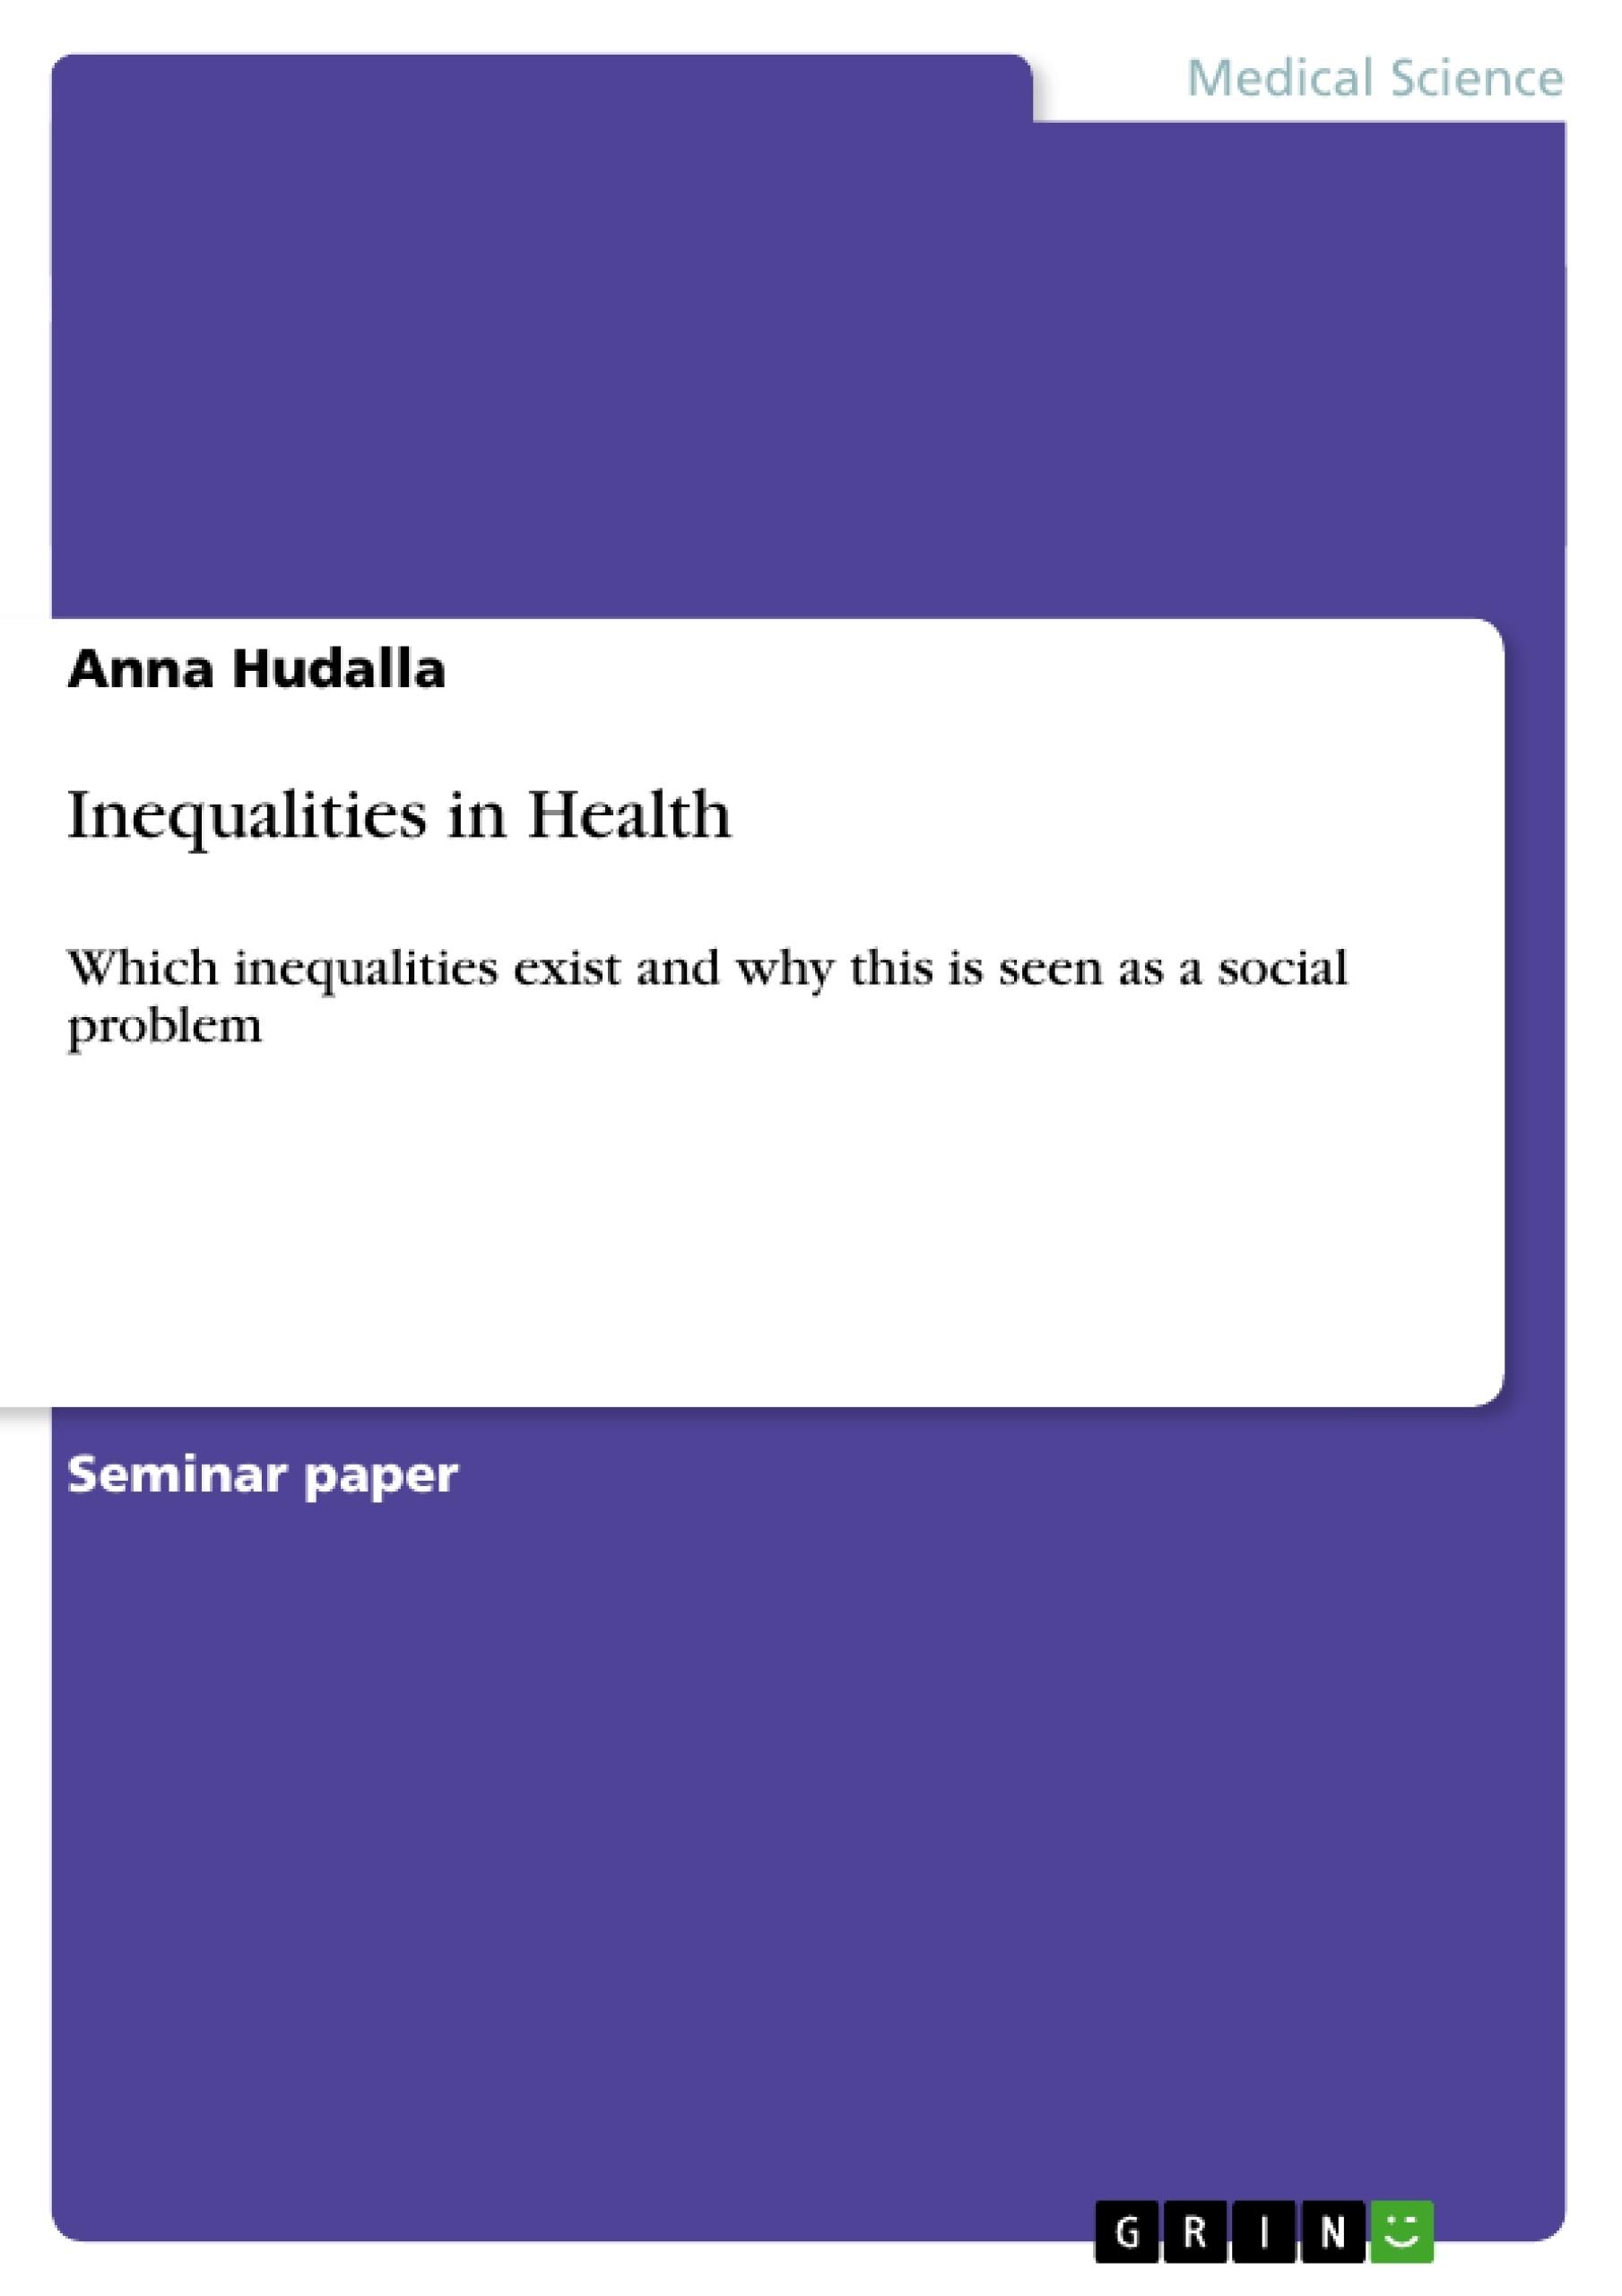 Title: Inequalities in Health